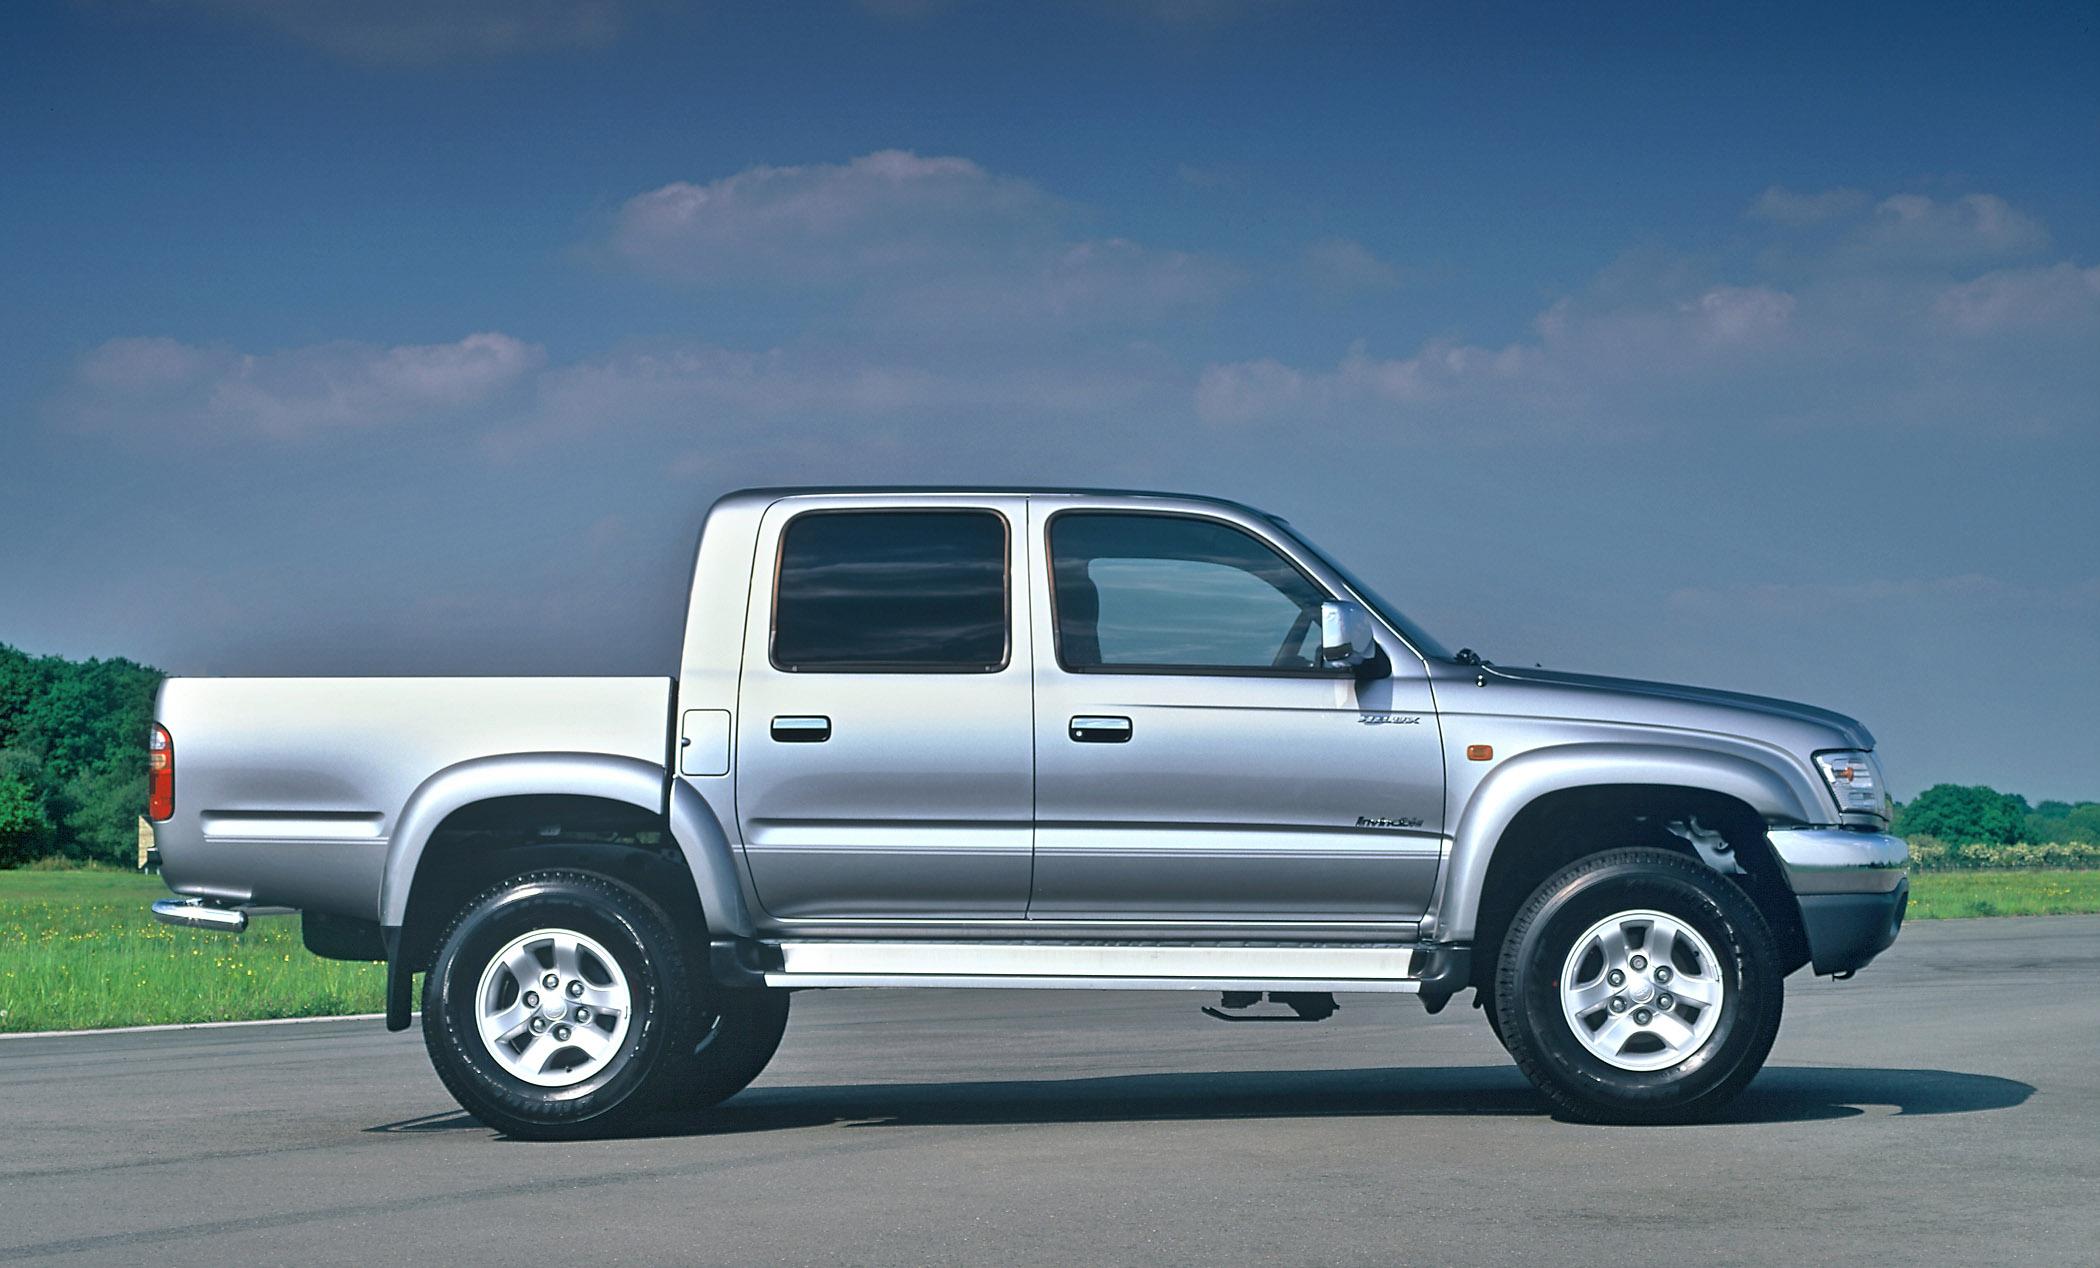 Toyota Hilux Invincible (2004)